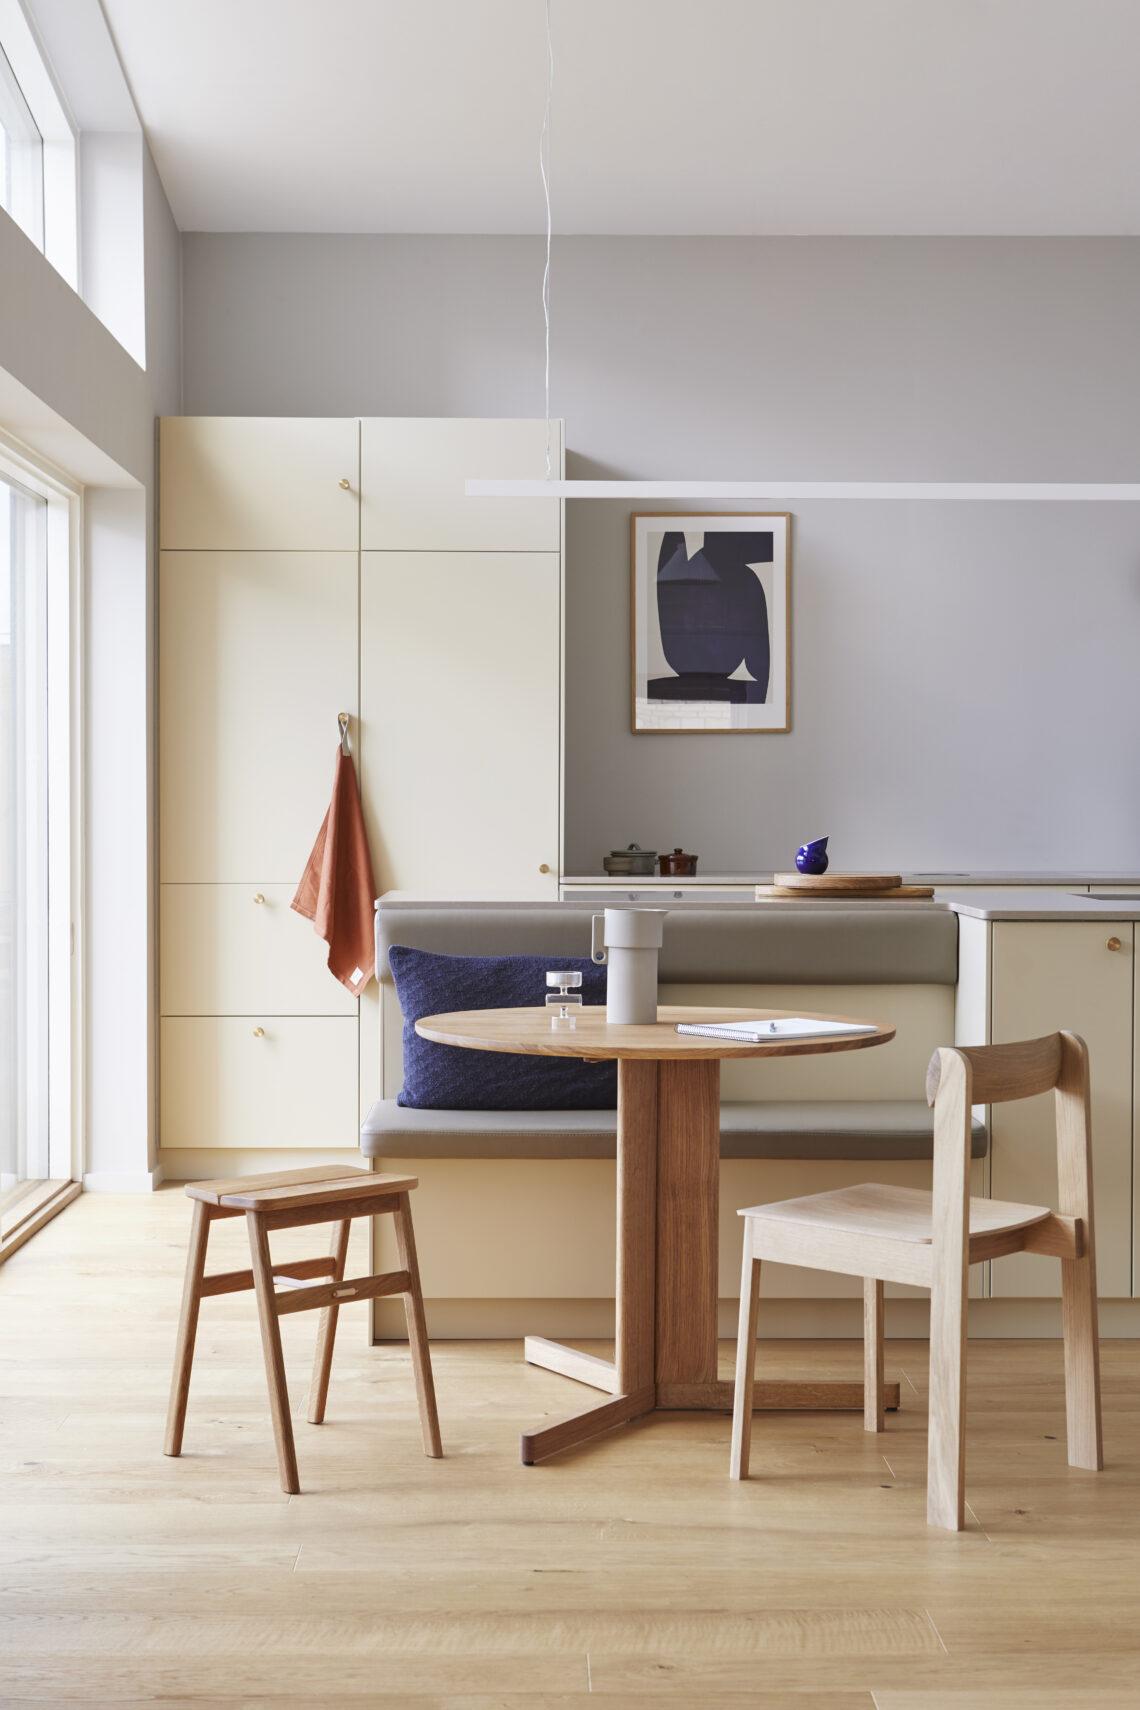 Form and refine Angle stool kruk eiken, Blueprint stoel eiken, Trefoil tafel rond